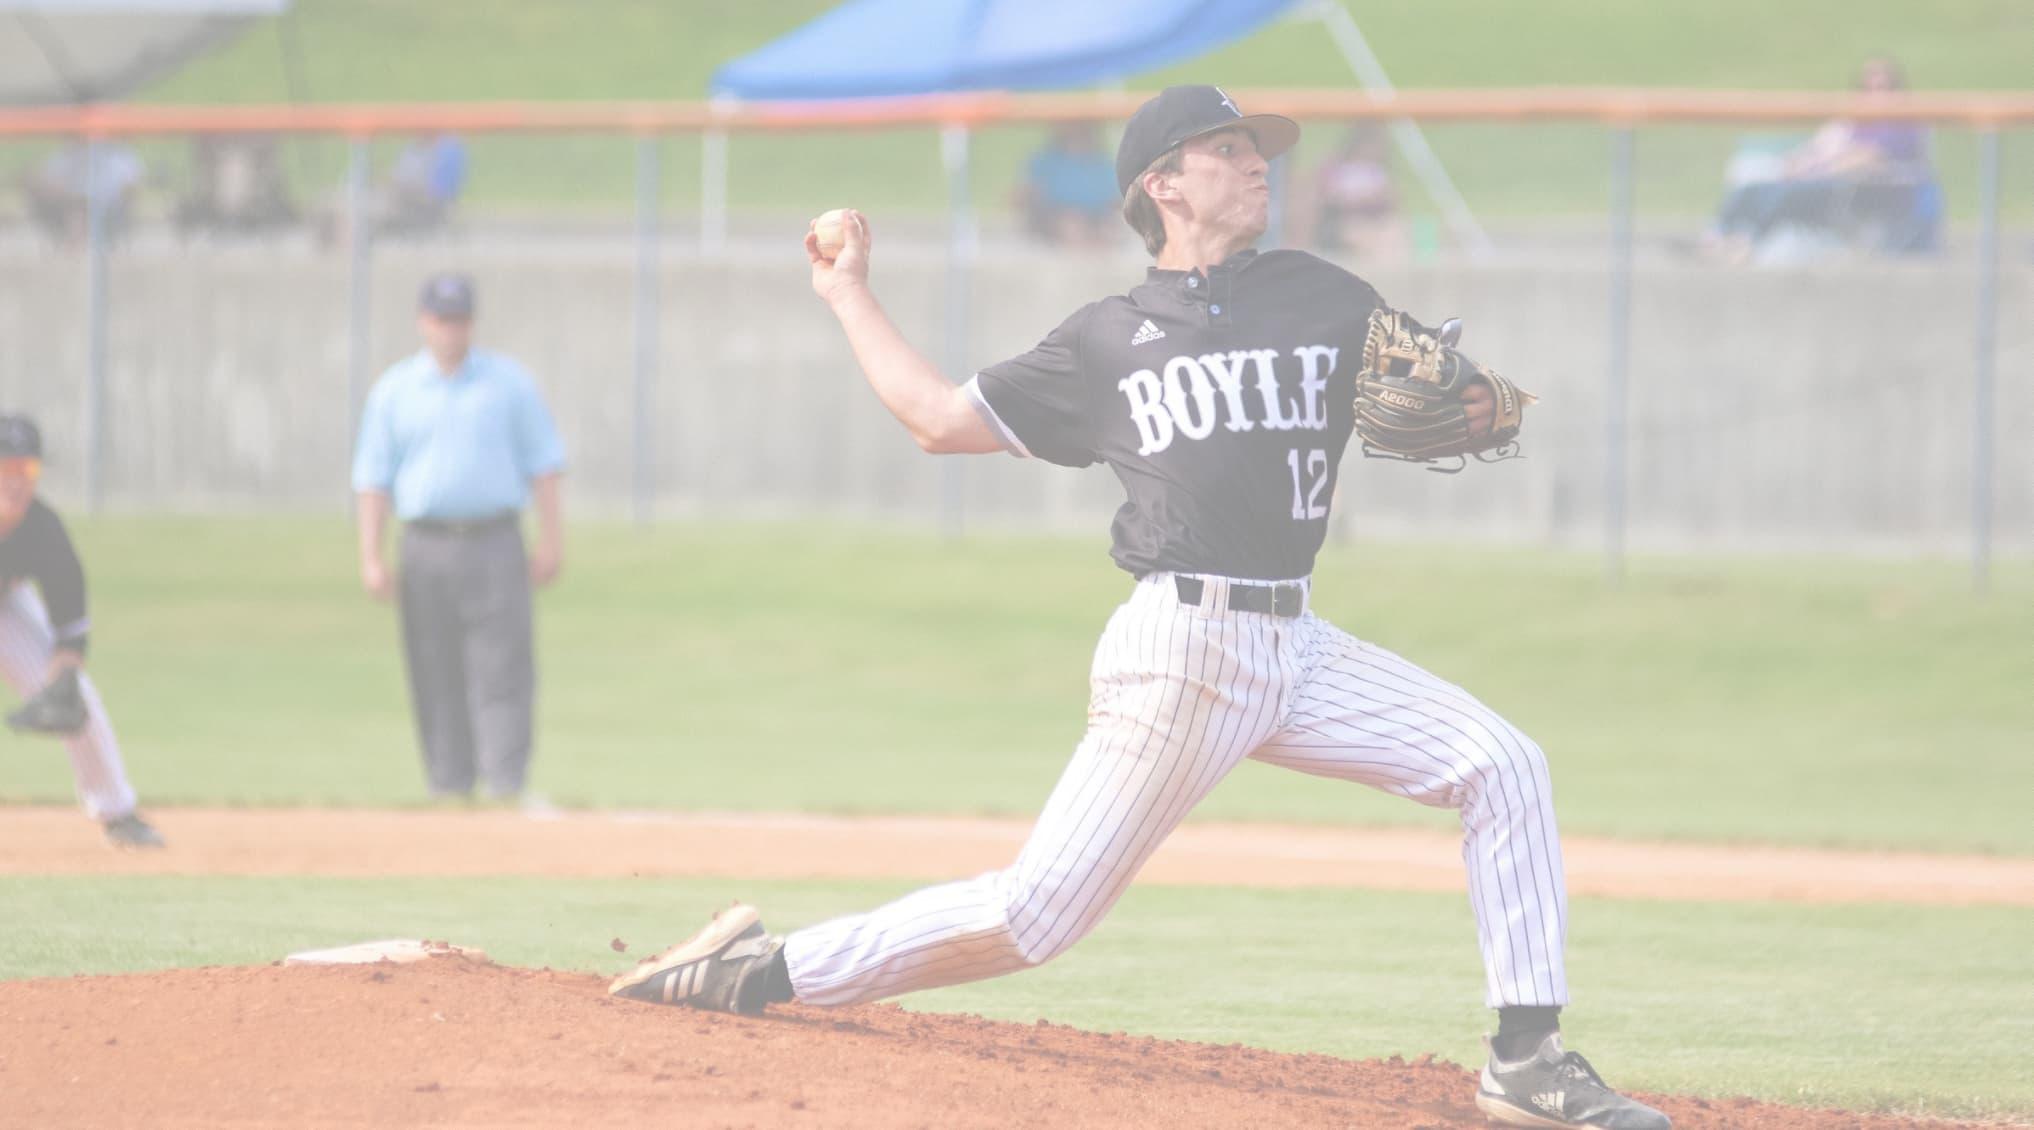 baseball pitching -89kb